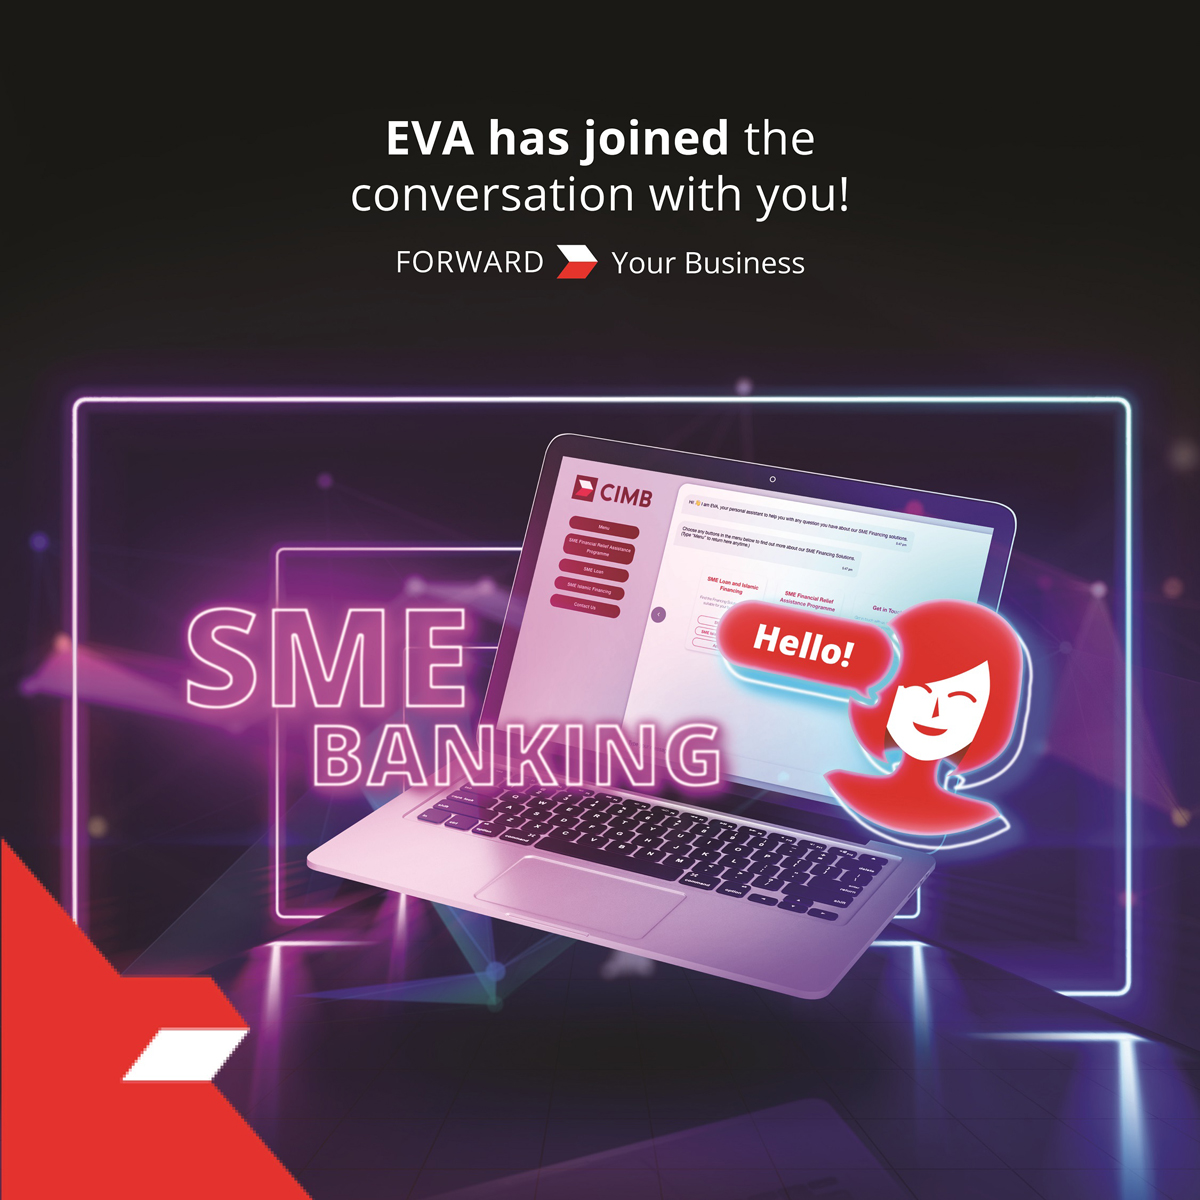 CIMB EVA Chatbot SME App AI Banking Bank